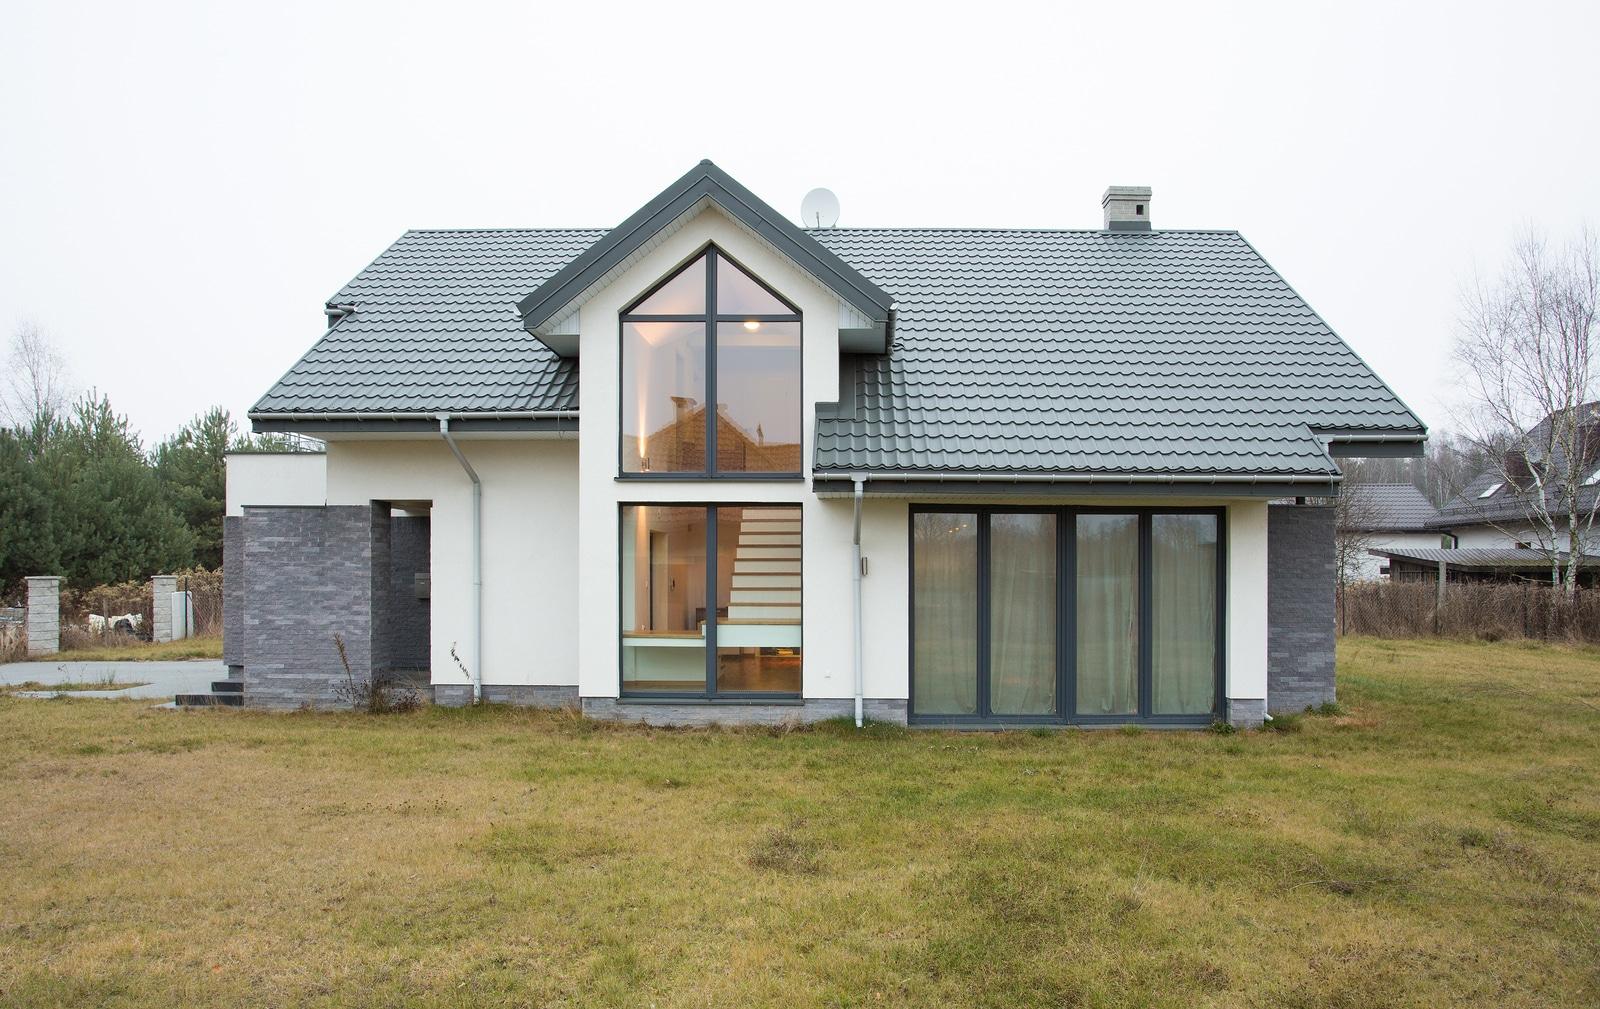 architekt-immobilien-bauplanung-stolberg-baucotec